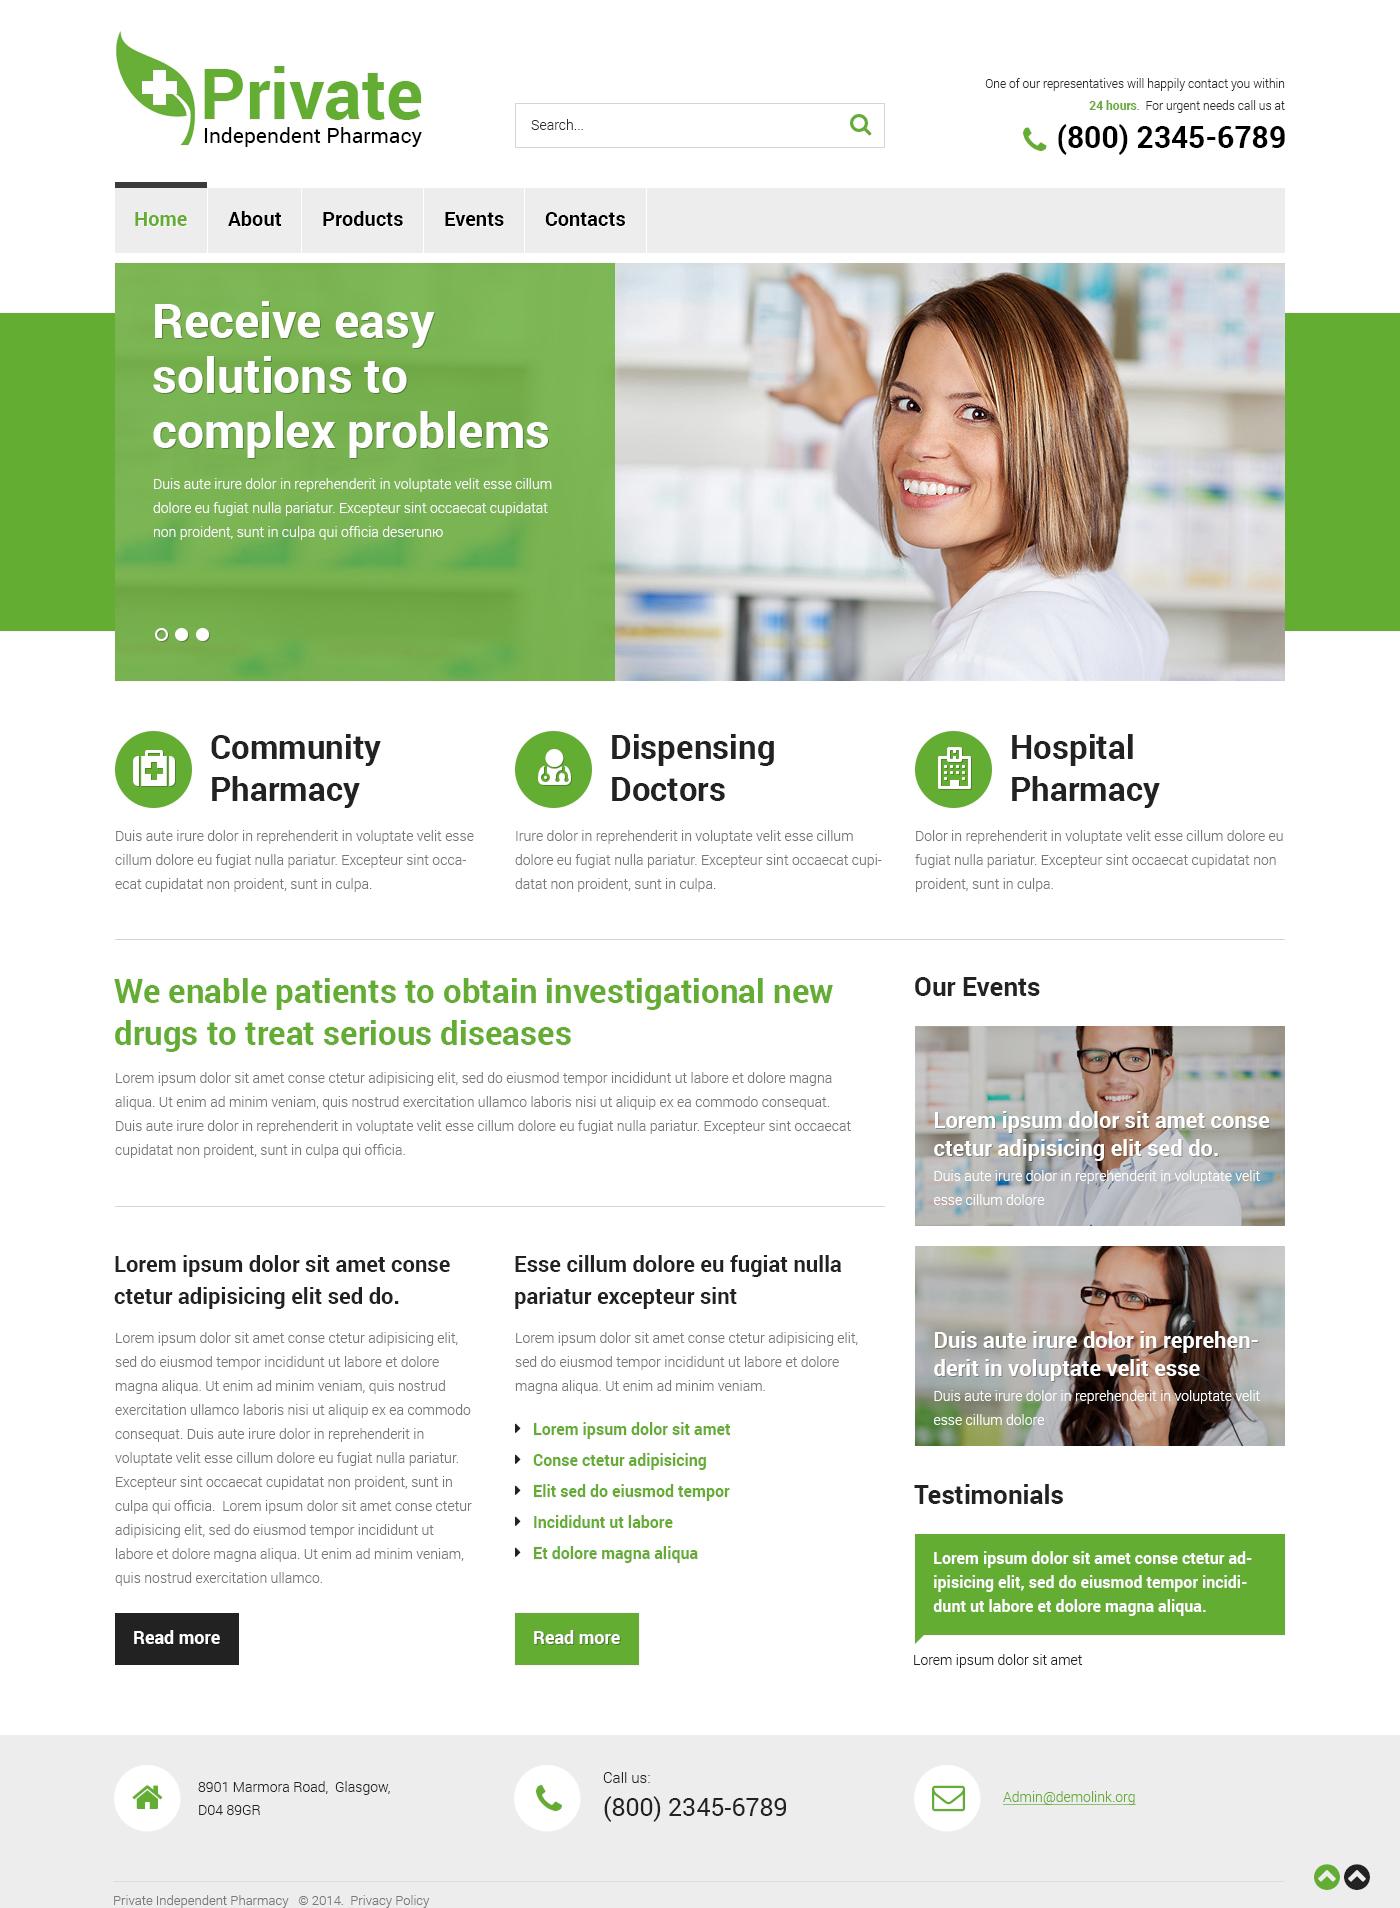 Plantilla Web Responsive para Sitio de Farmacias #49443